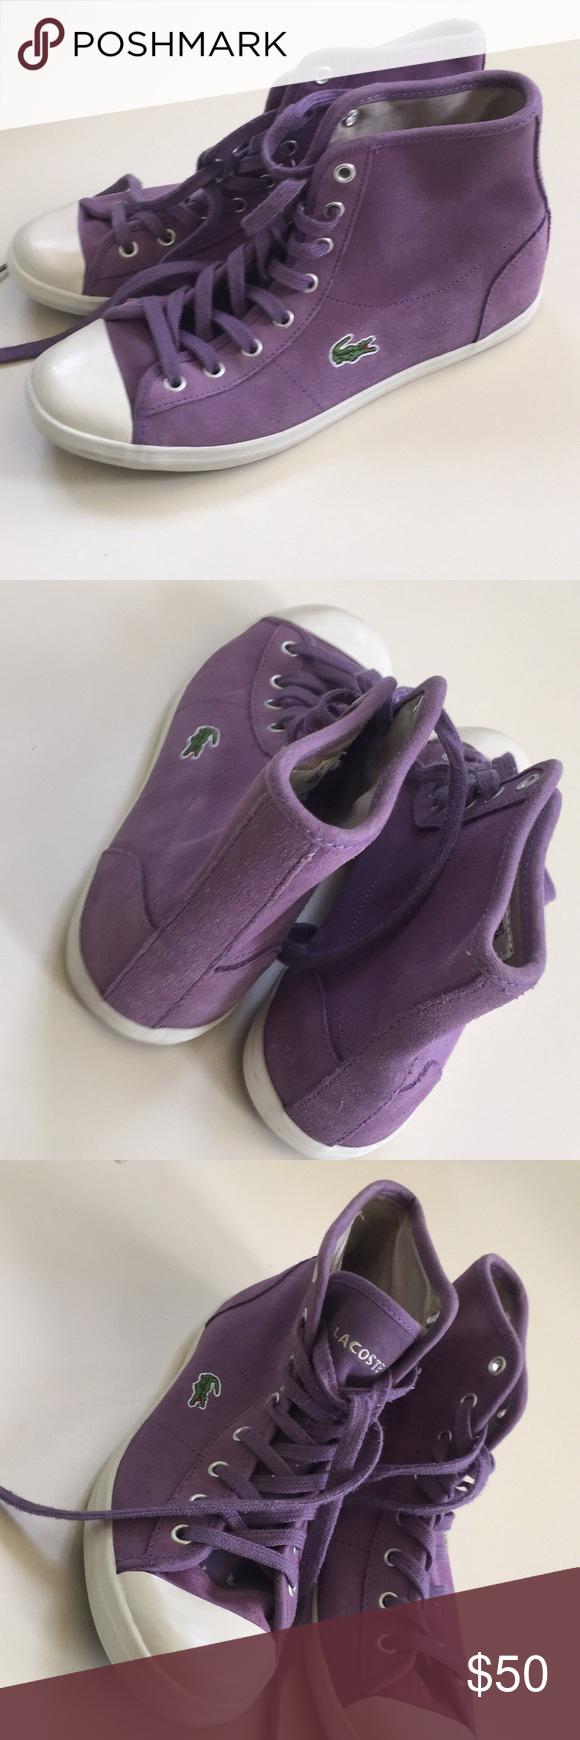 Lacoste suede shoes   Suede shoes